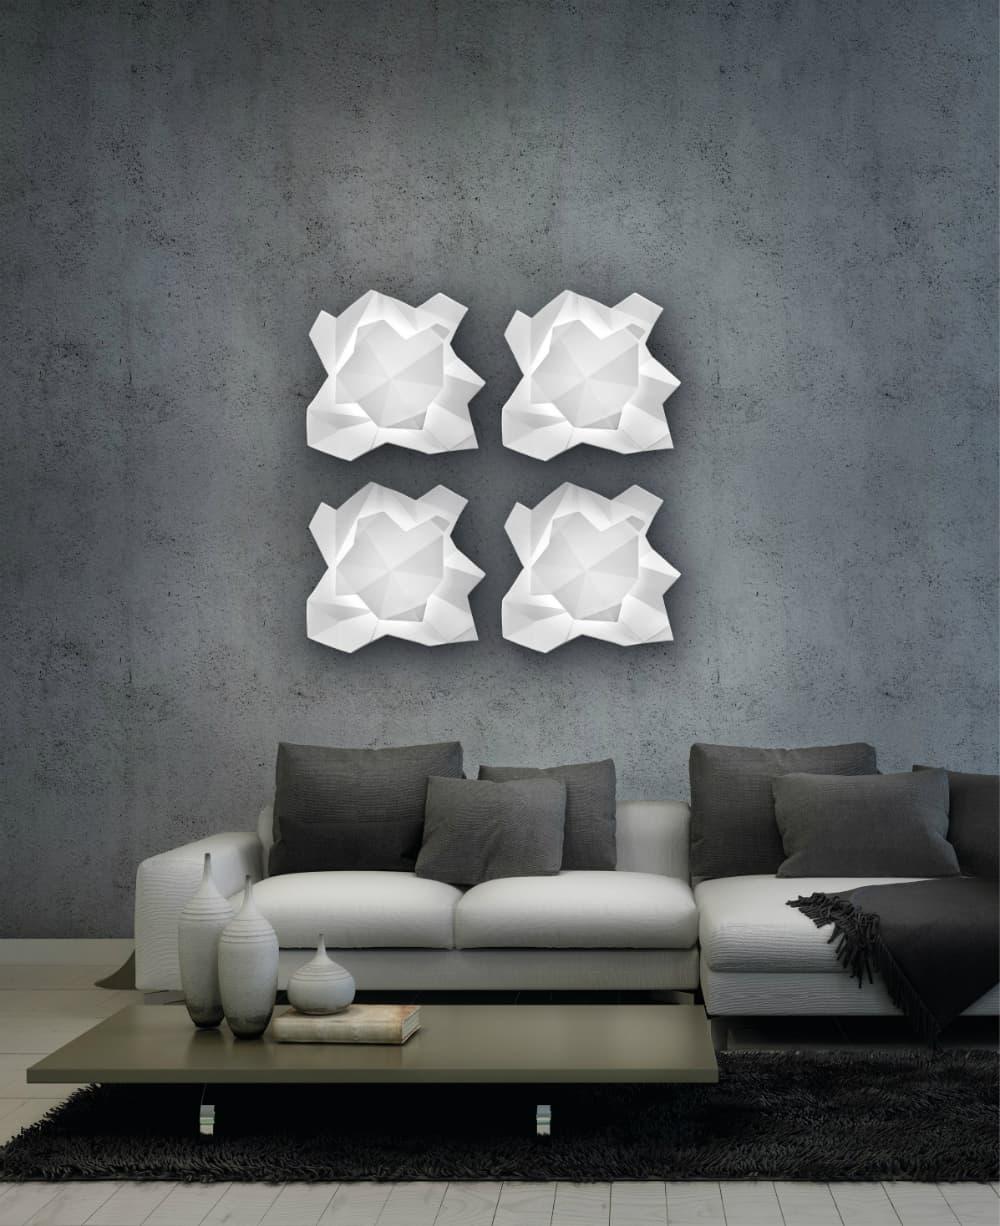 Sierra wall light by Metal Lux di Baccega R.&C.